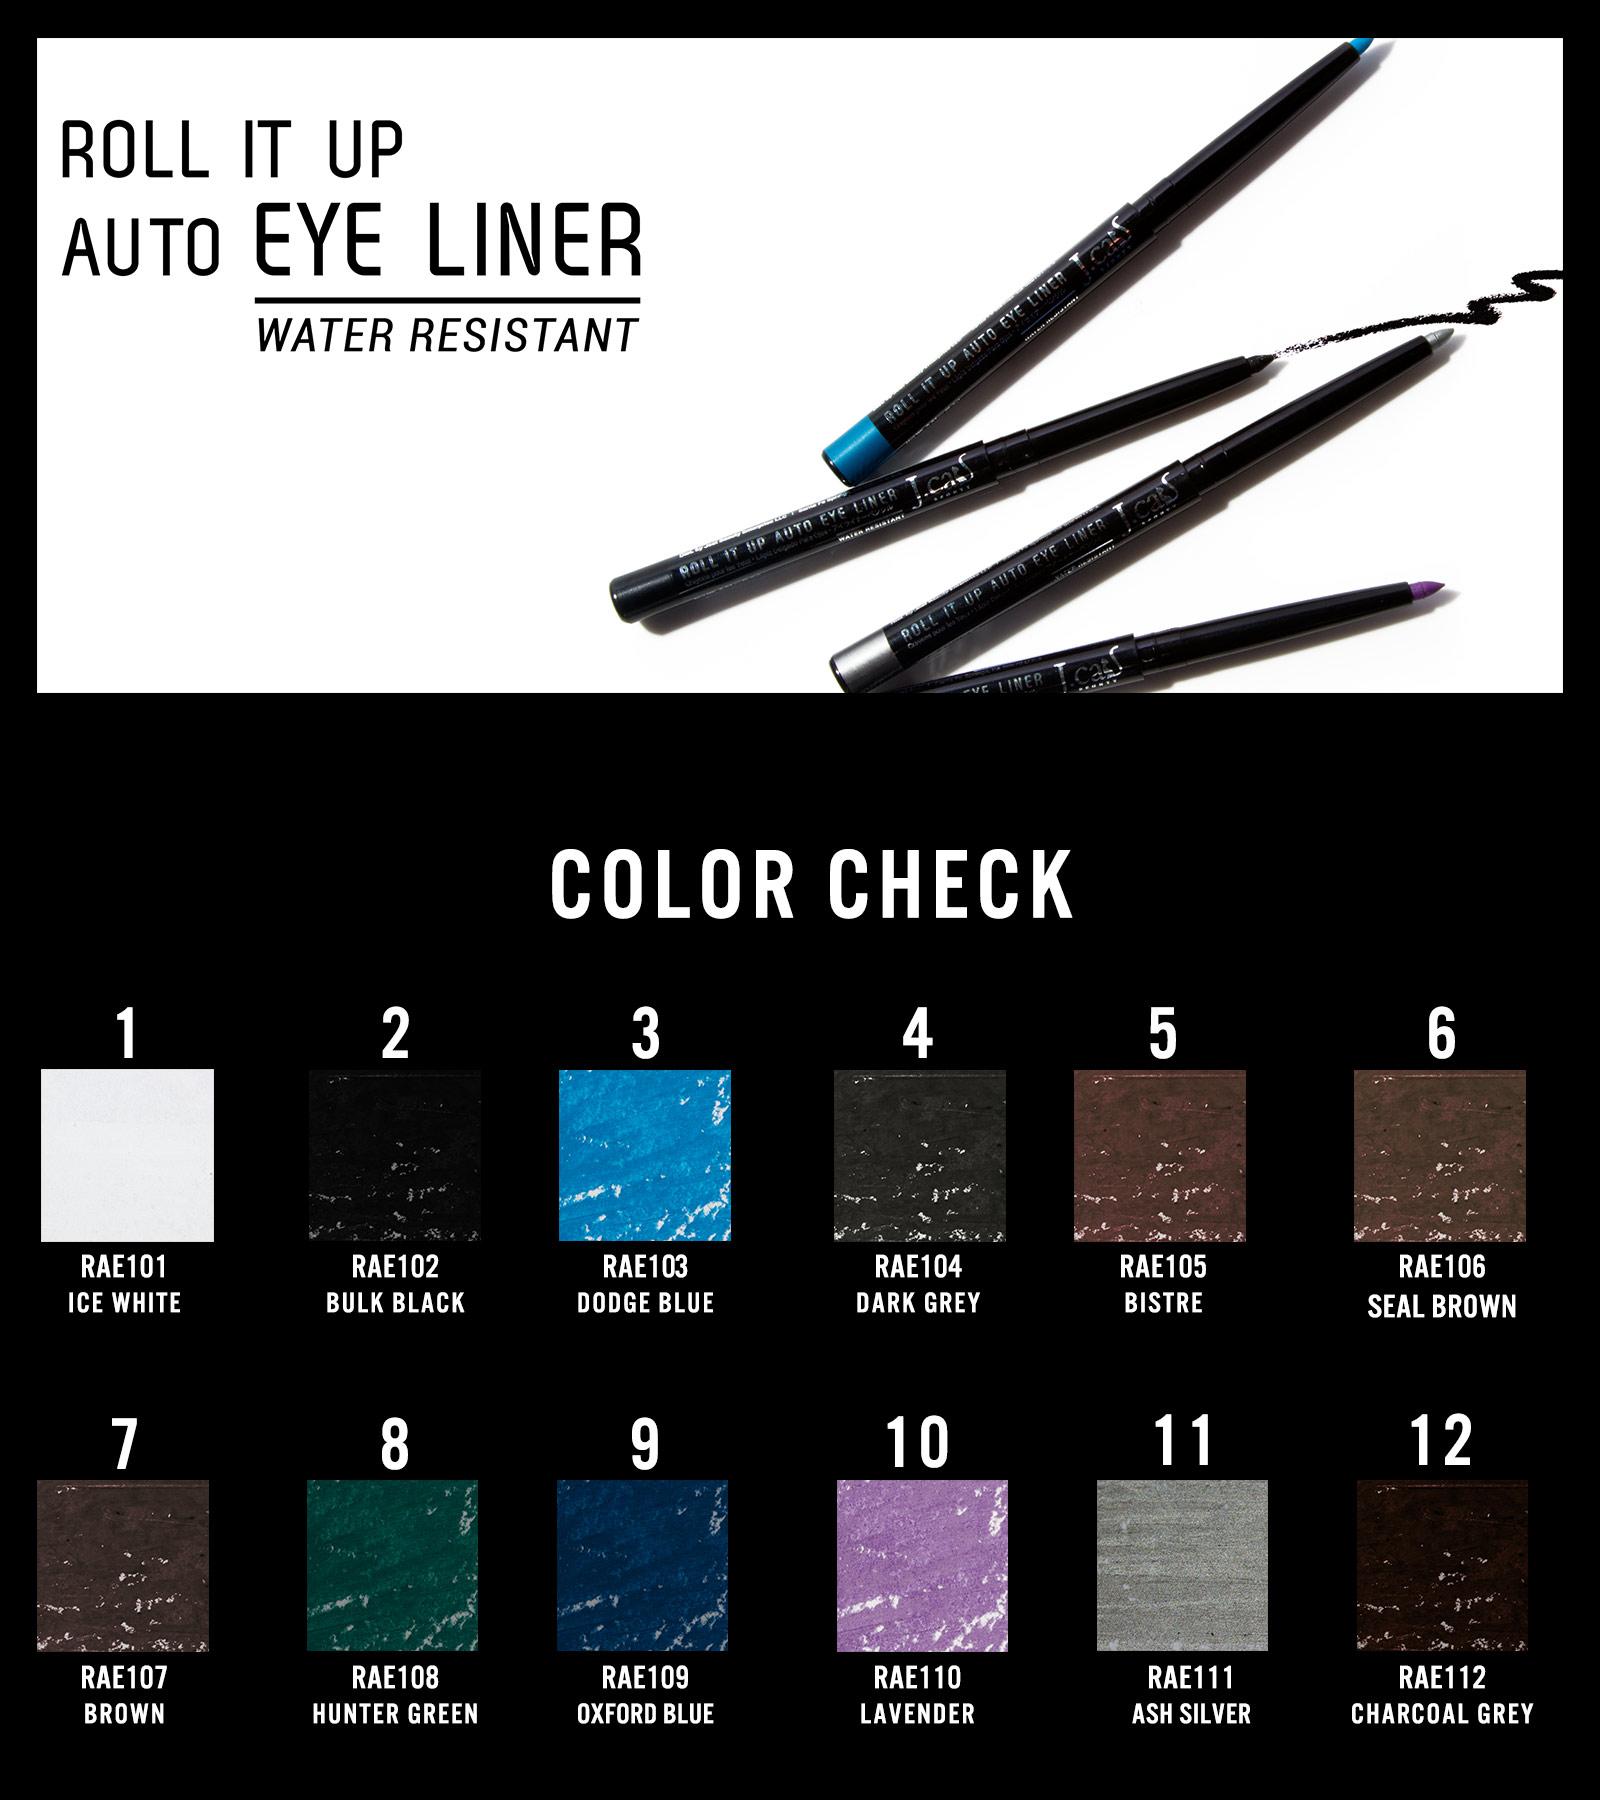 J.Cat Beauty Roll It Up Auto Eye Liner Eyeliner Set - 12 verschiedene Farben